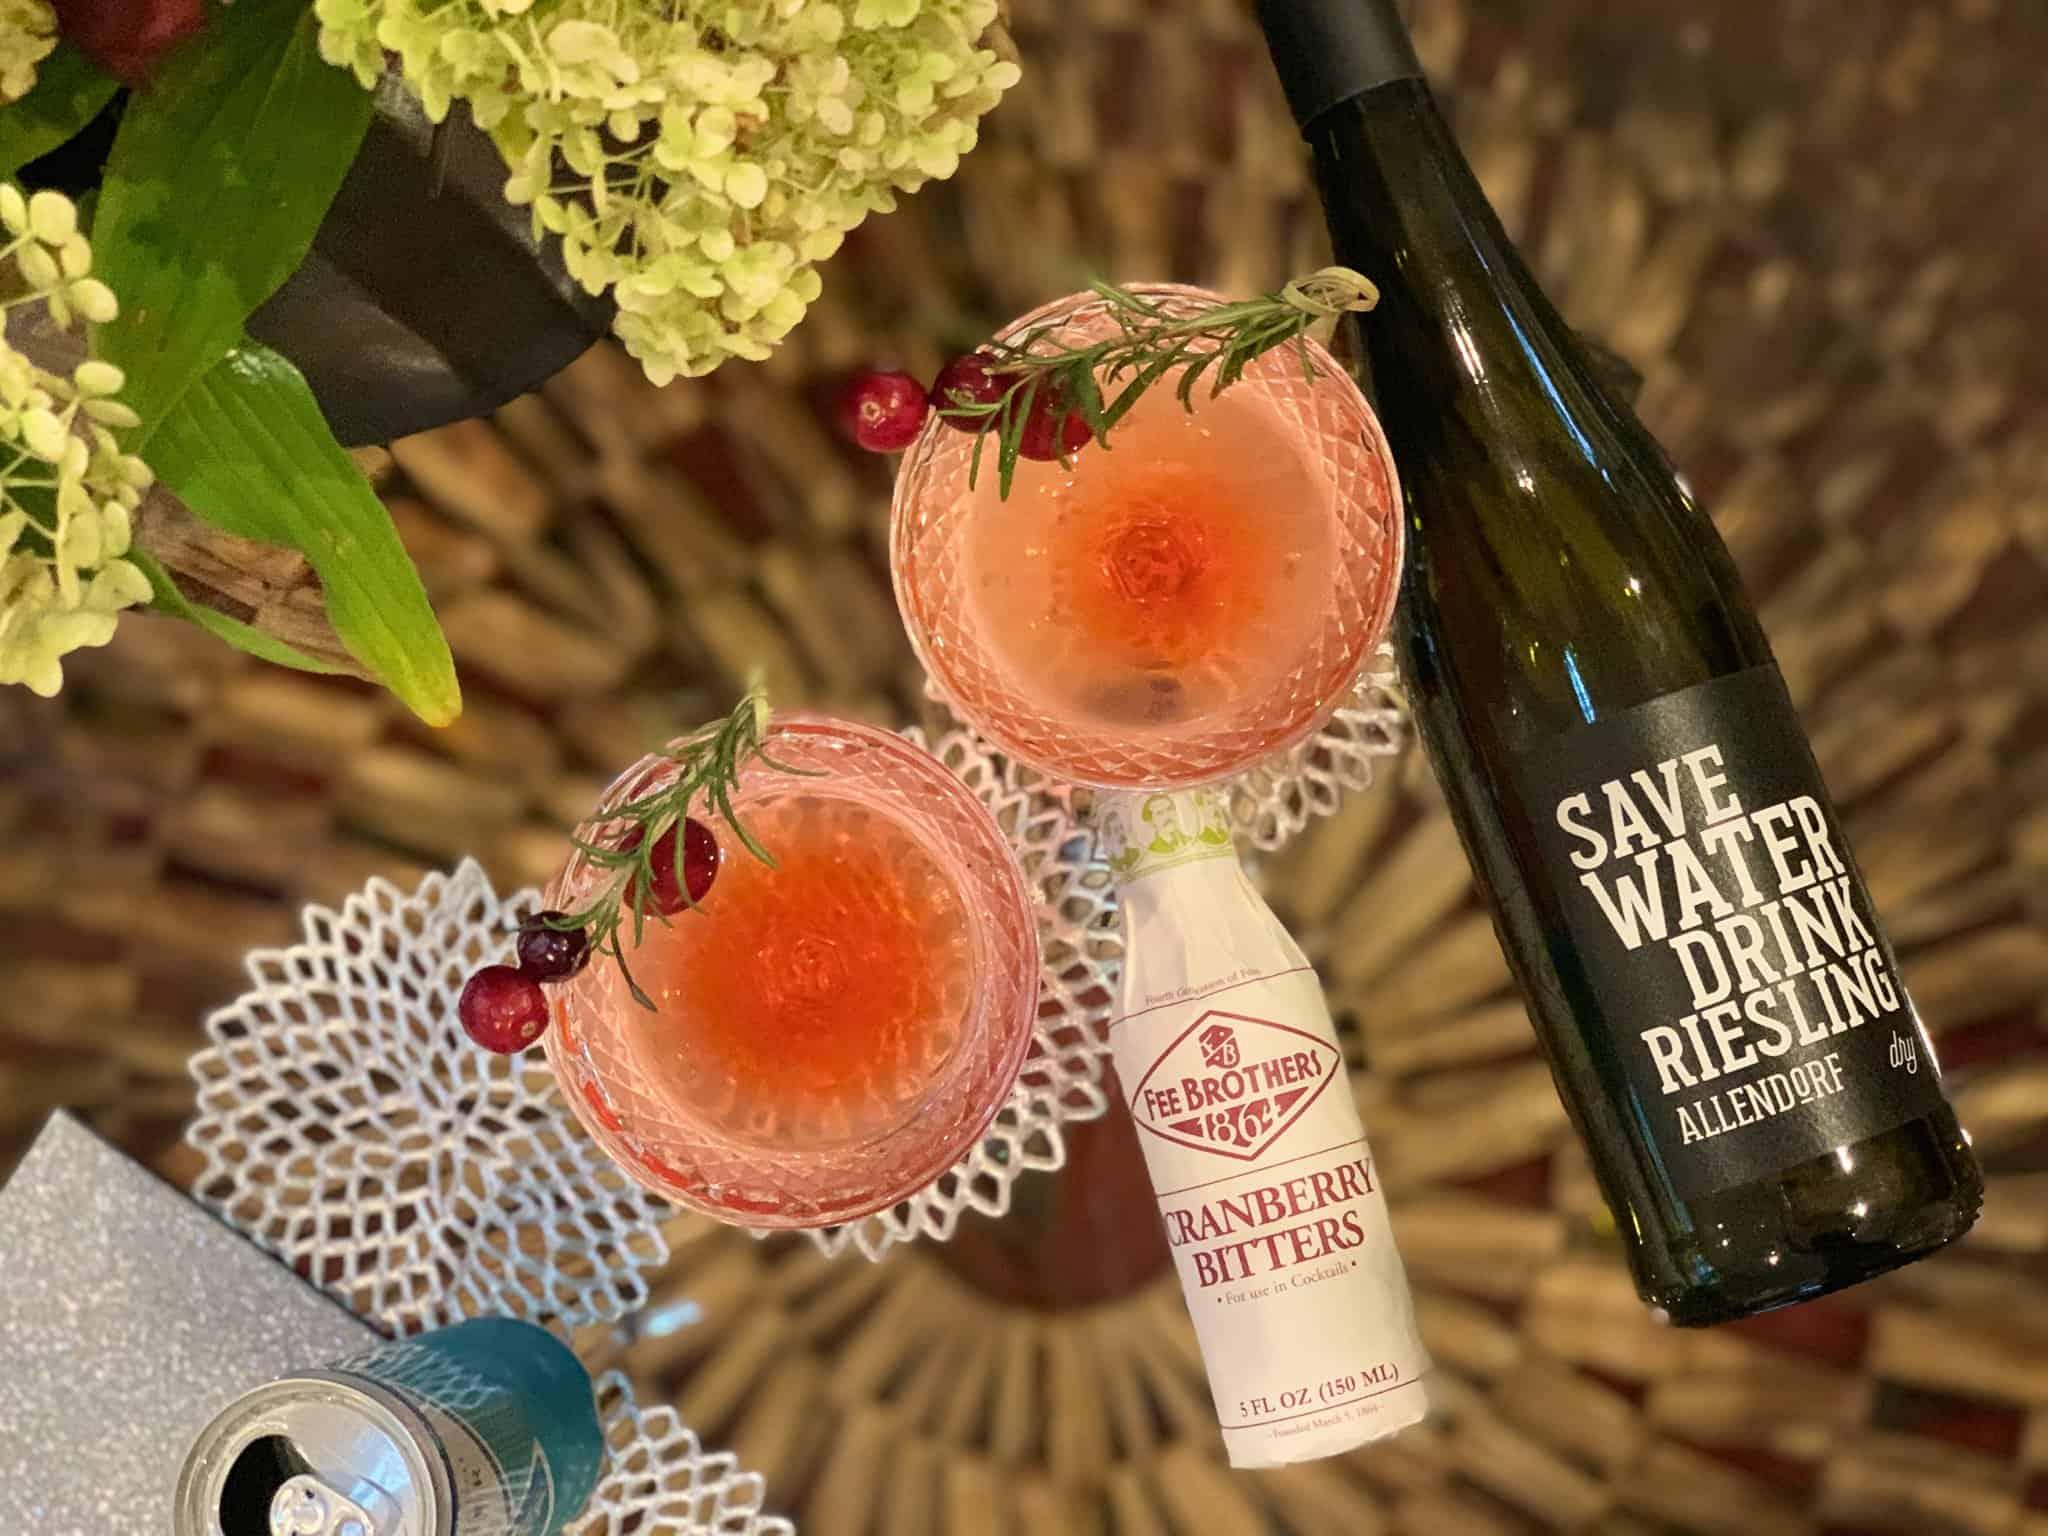 5 Ways to Enjoy German Riesling Wines This Holiday Season